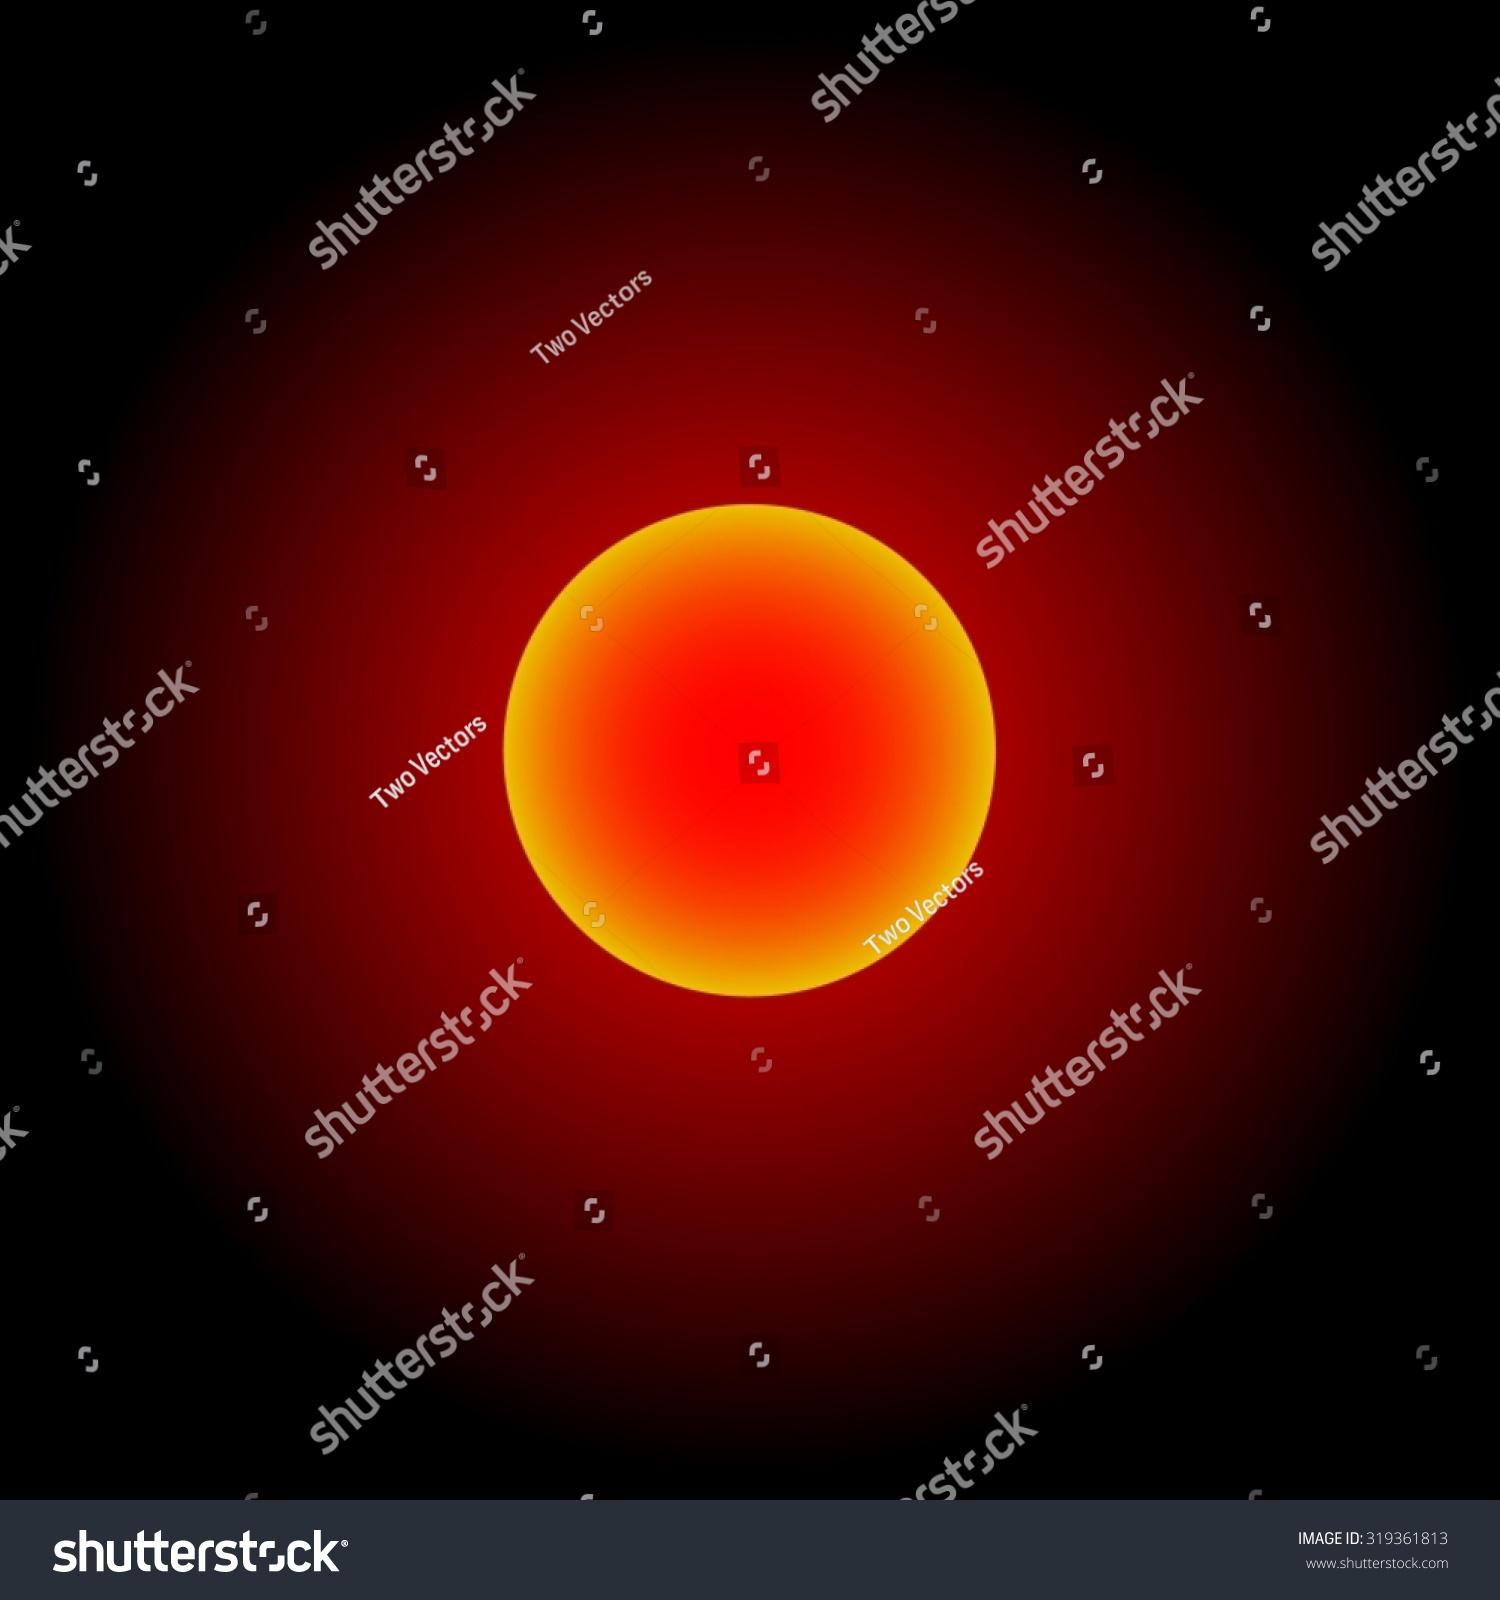 Kerberos Moon Of Plluto: Red Shinning Sun; Pluto; Jupiter; Charon; Moon; Dwarf